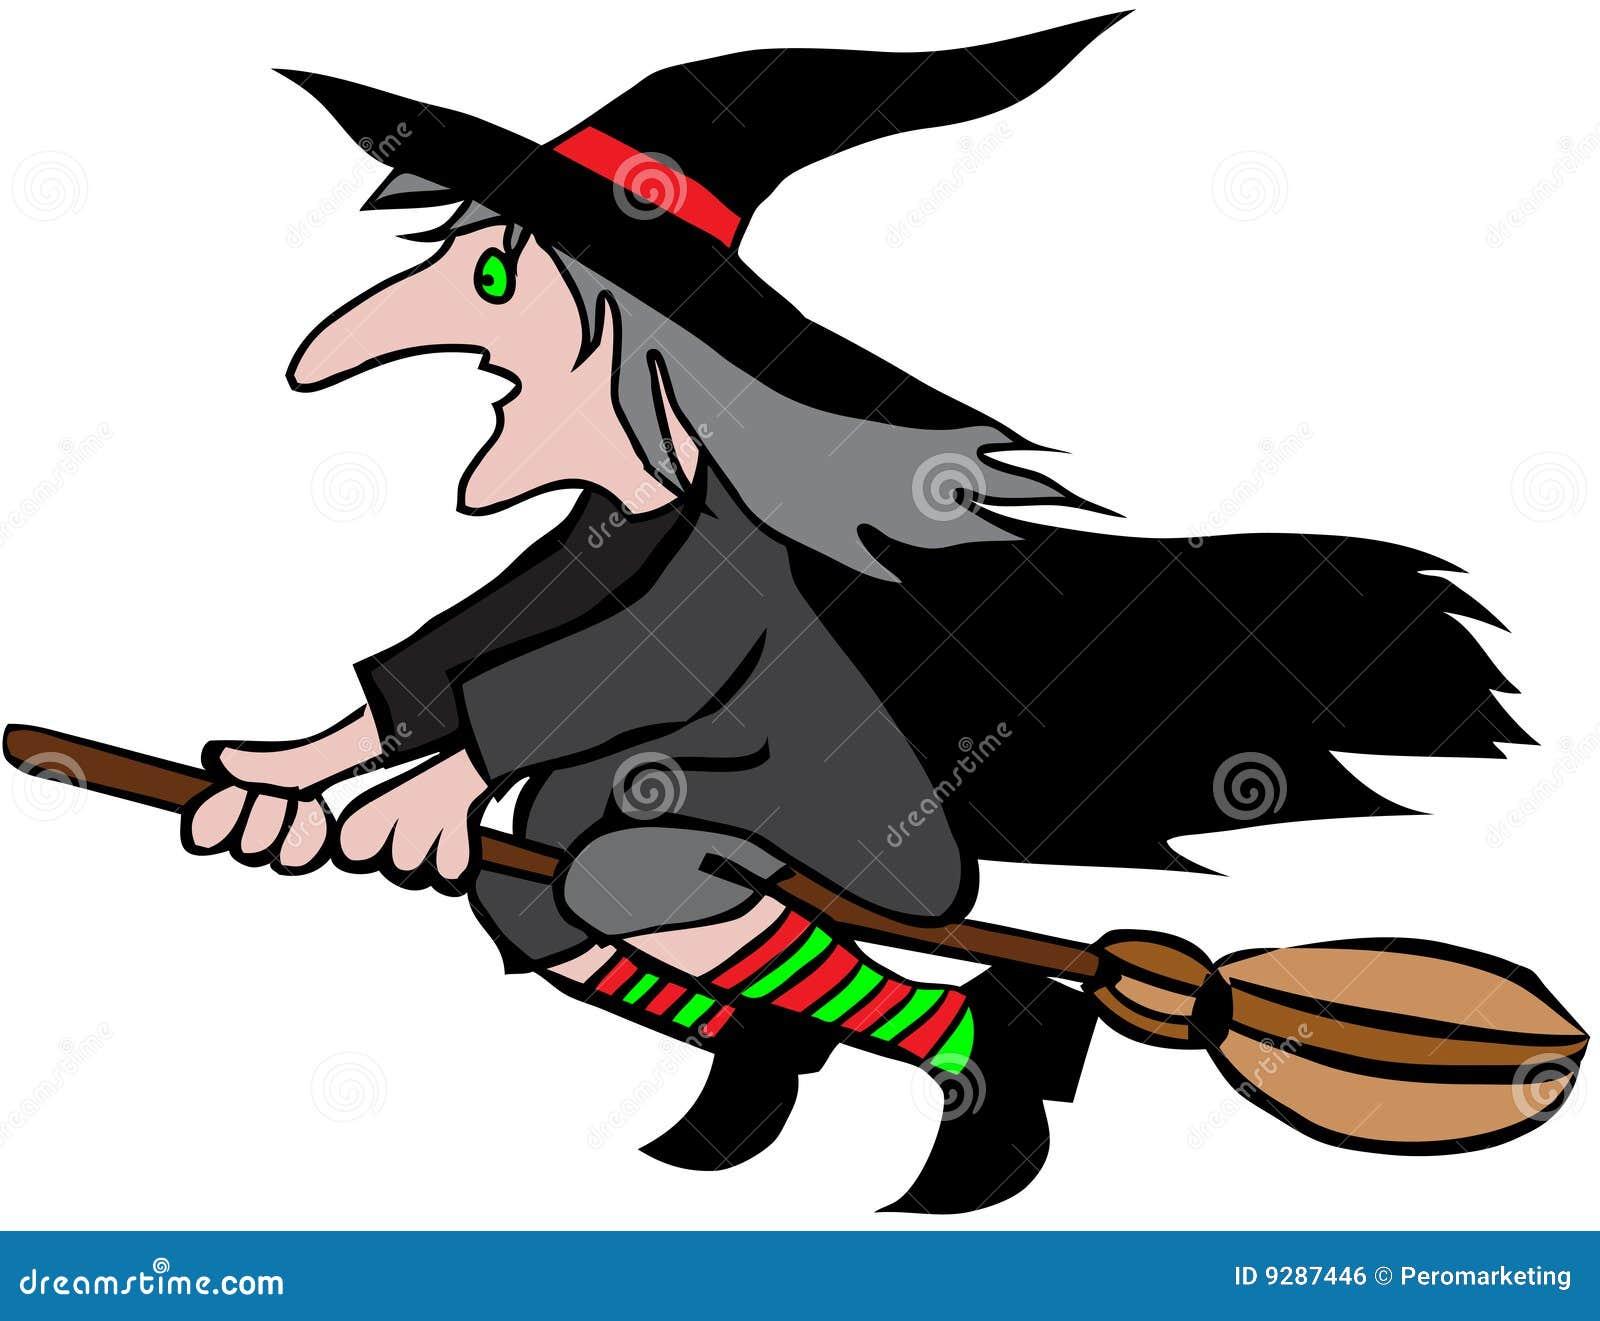 broomstick cartoon flying halloween witch - Halloween Witch Cartoon